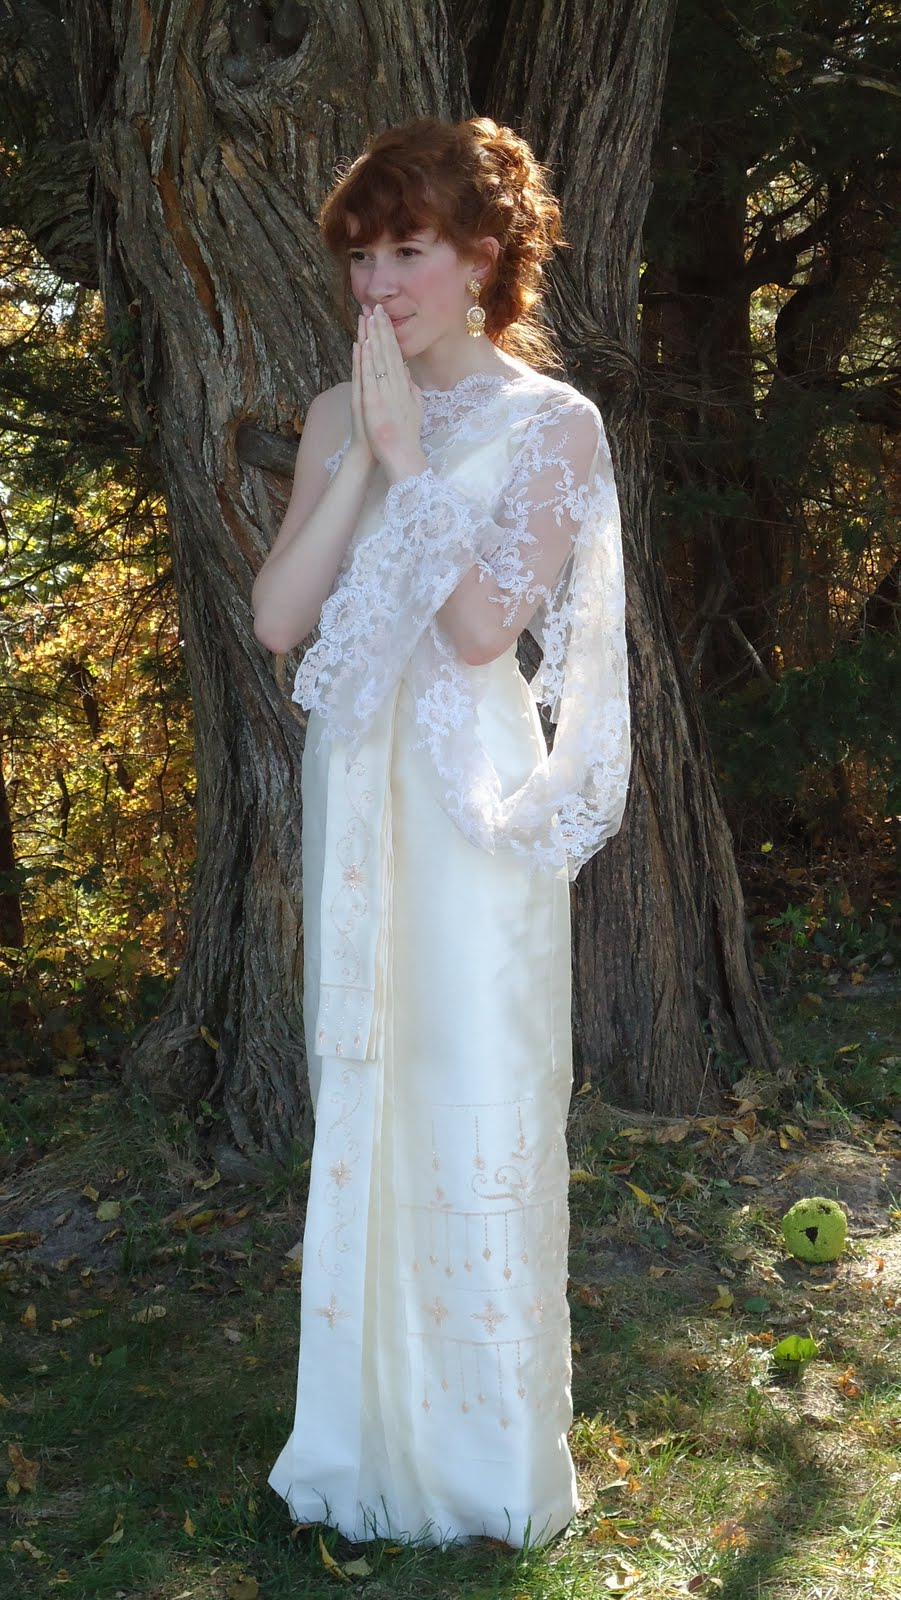 Thailand Wedding Dresses - List Of Wedding Dresses